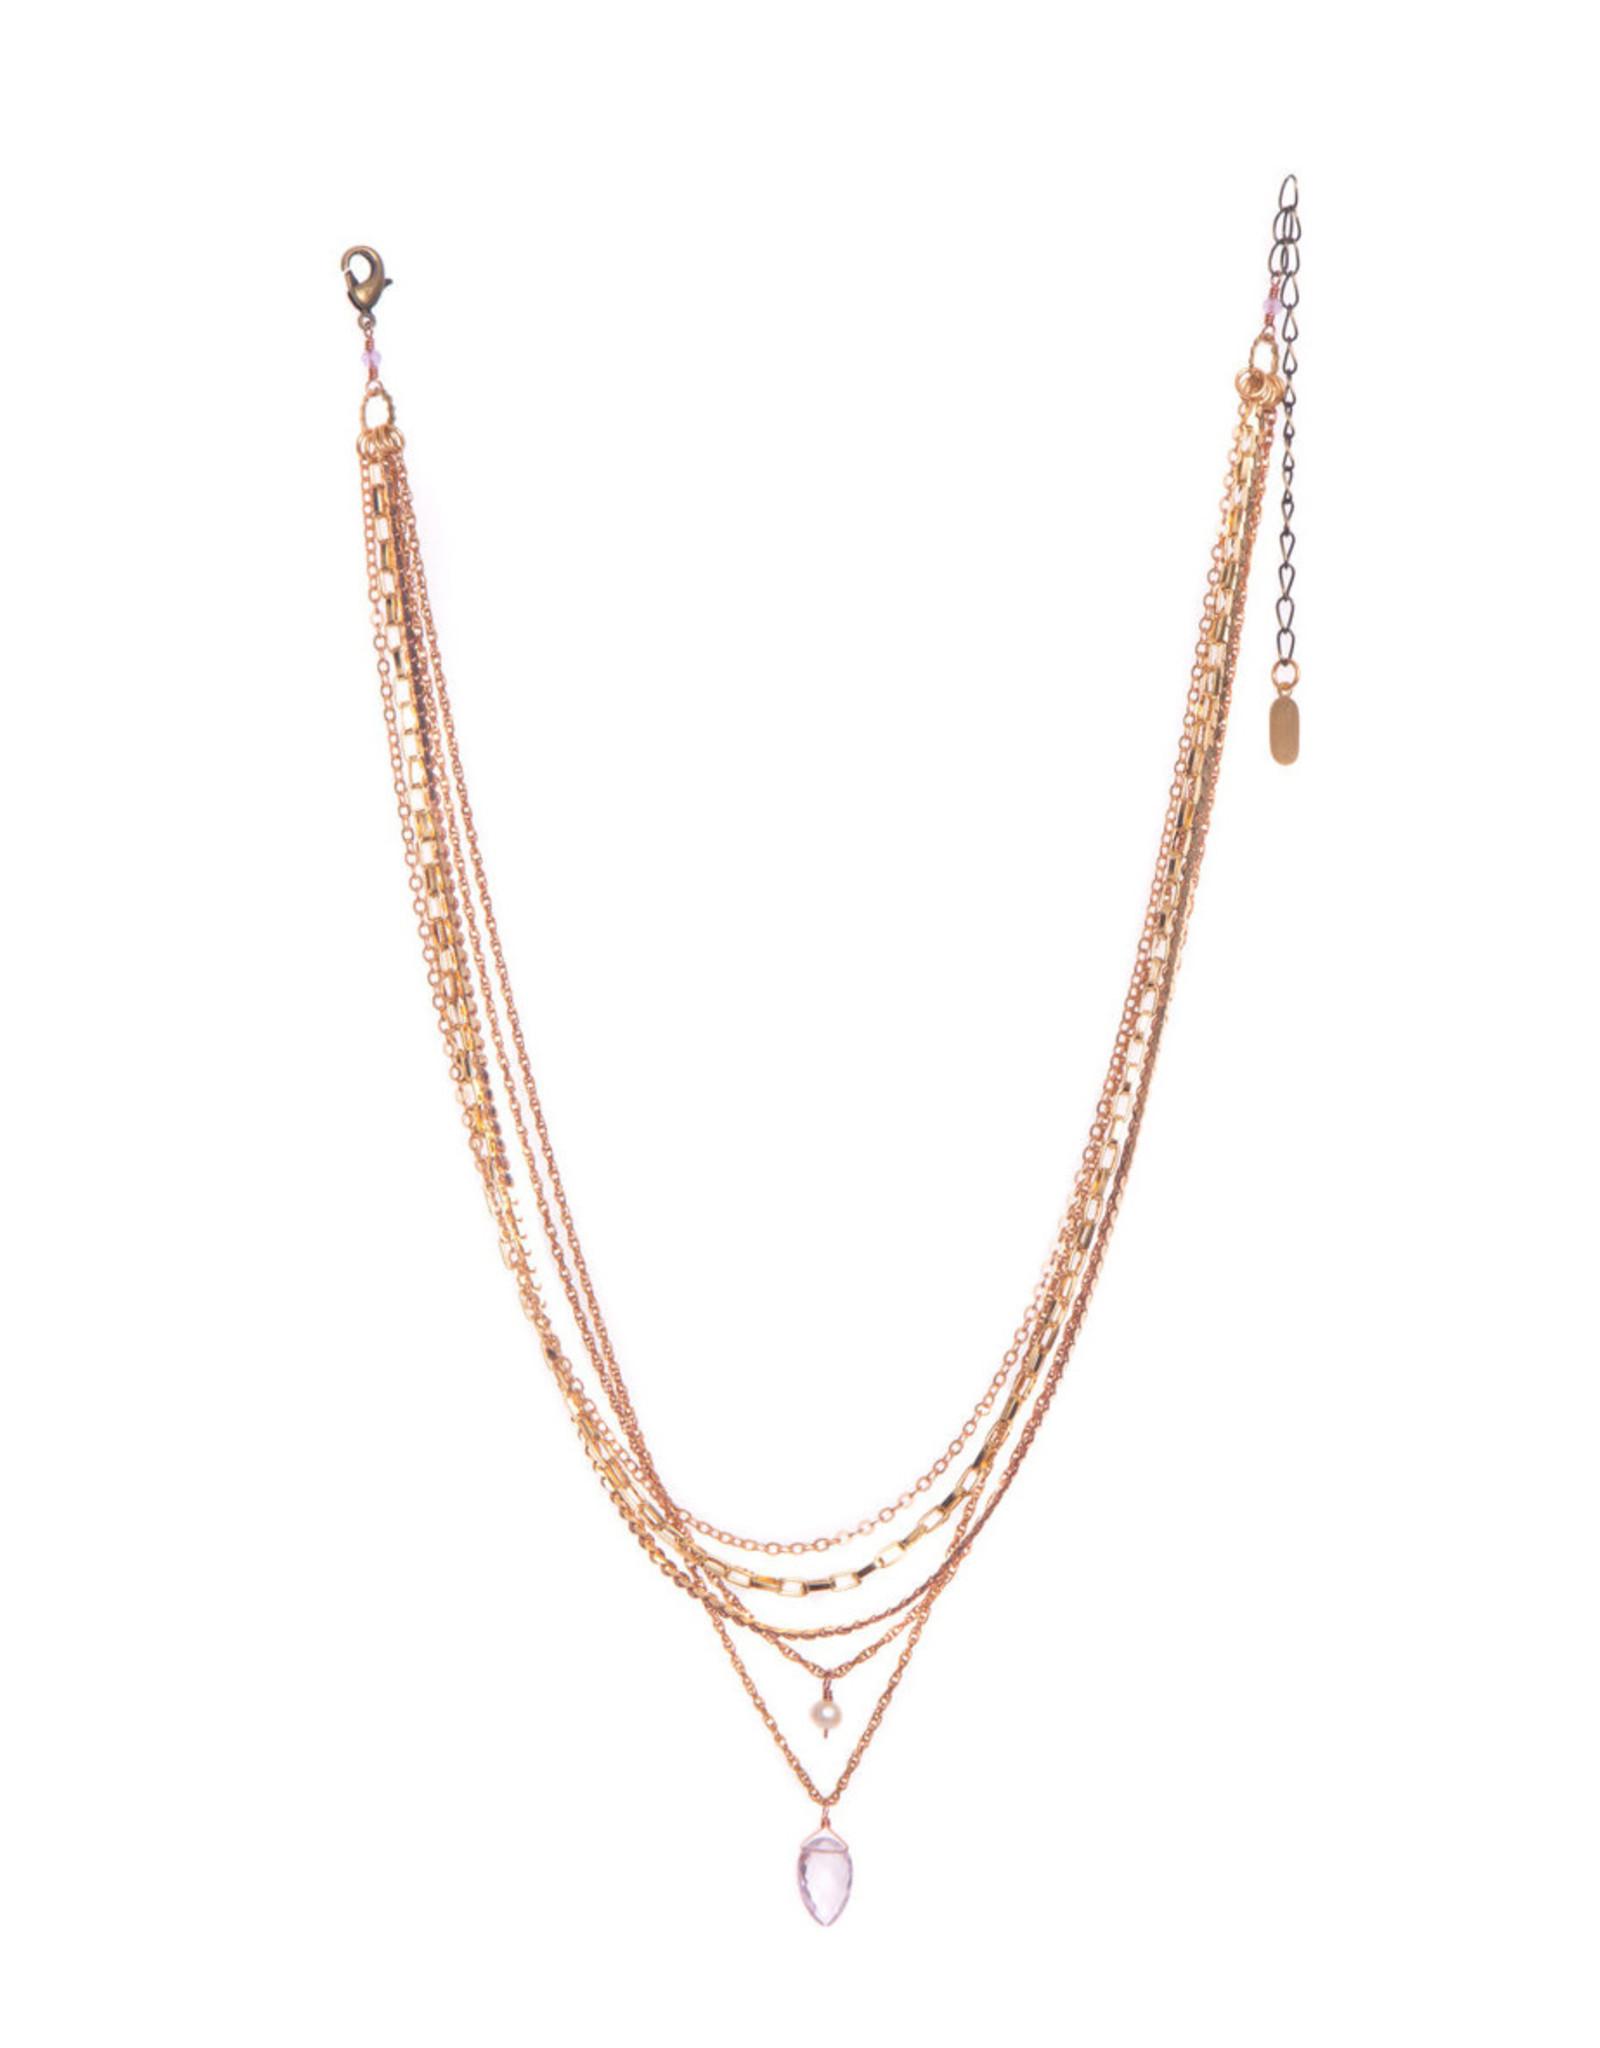 Hailey Gerrits Designs Playa Necklace - Pink Amethyst